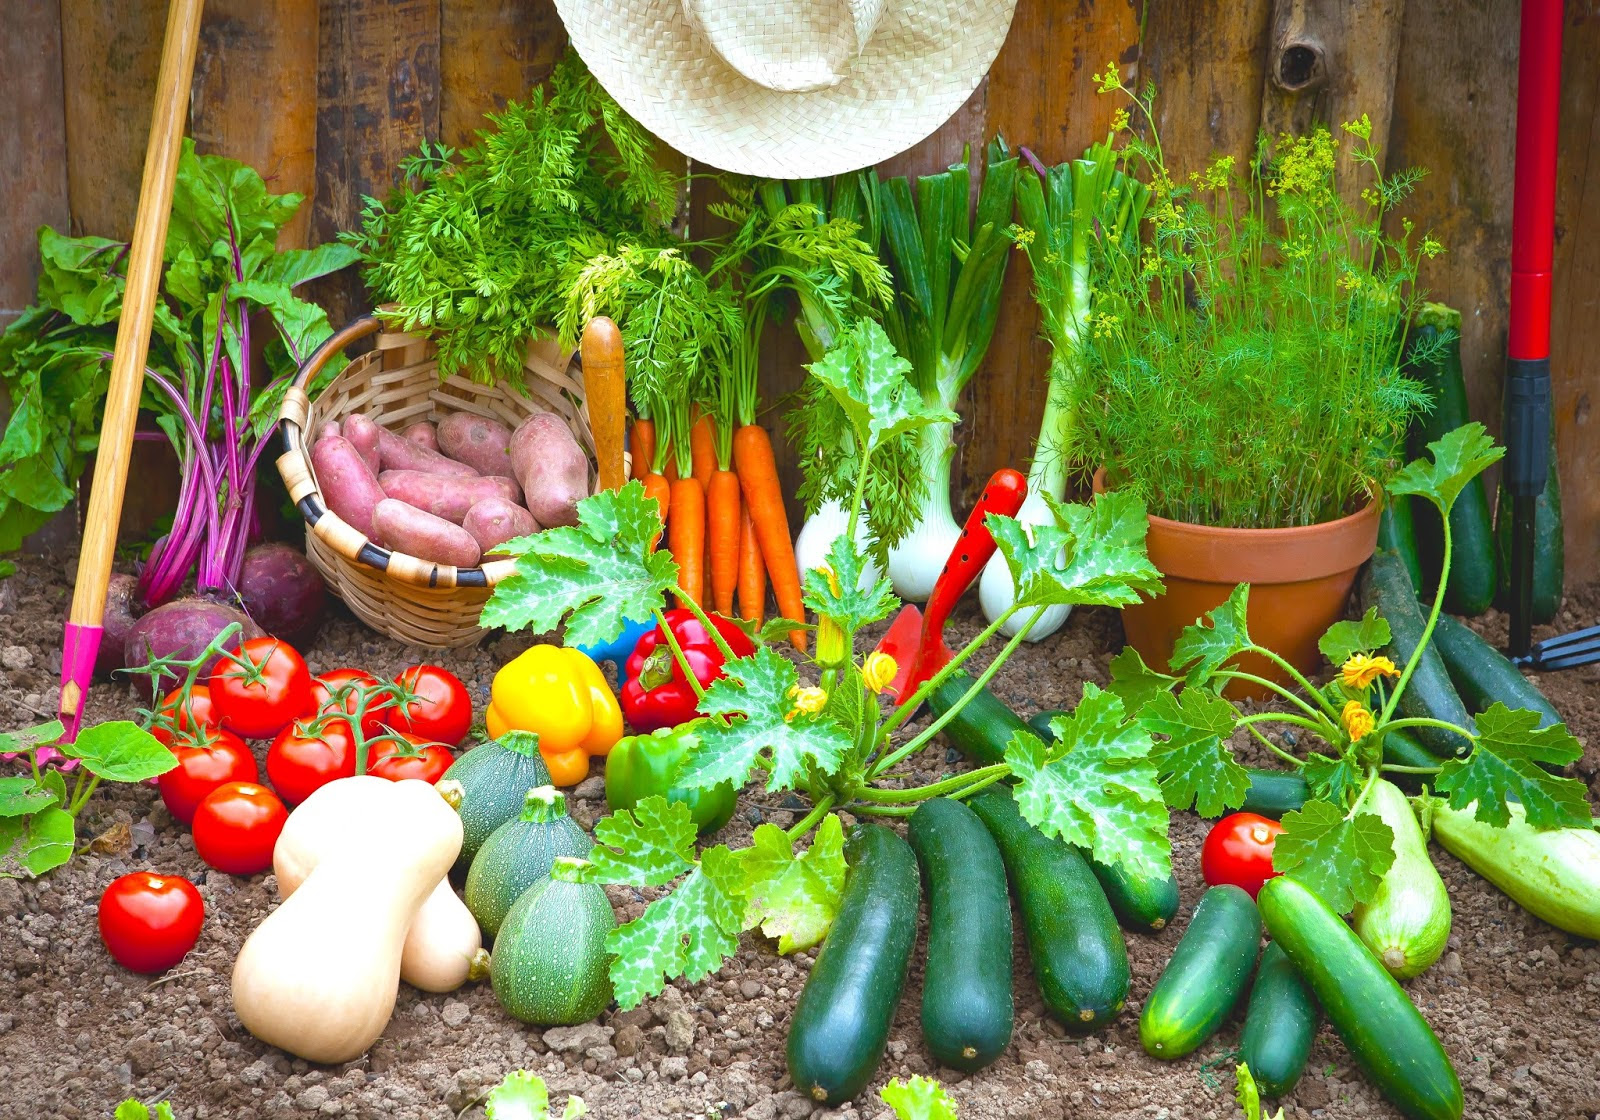 easy vegetable garden plants in spring vegetable garden